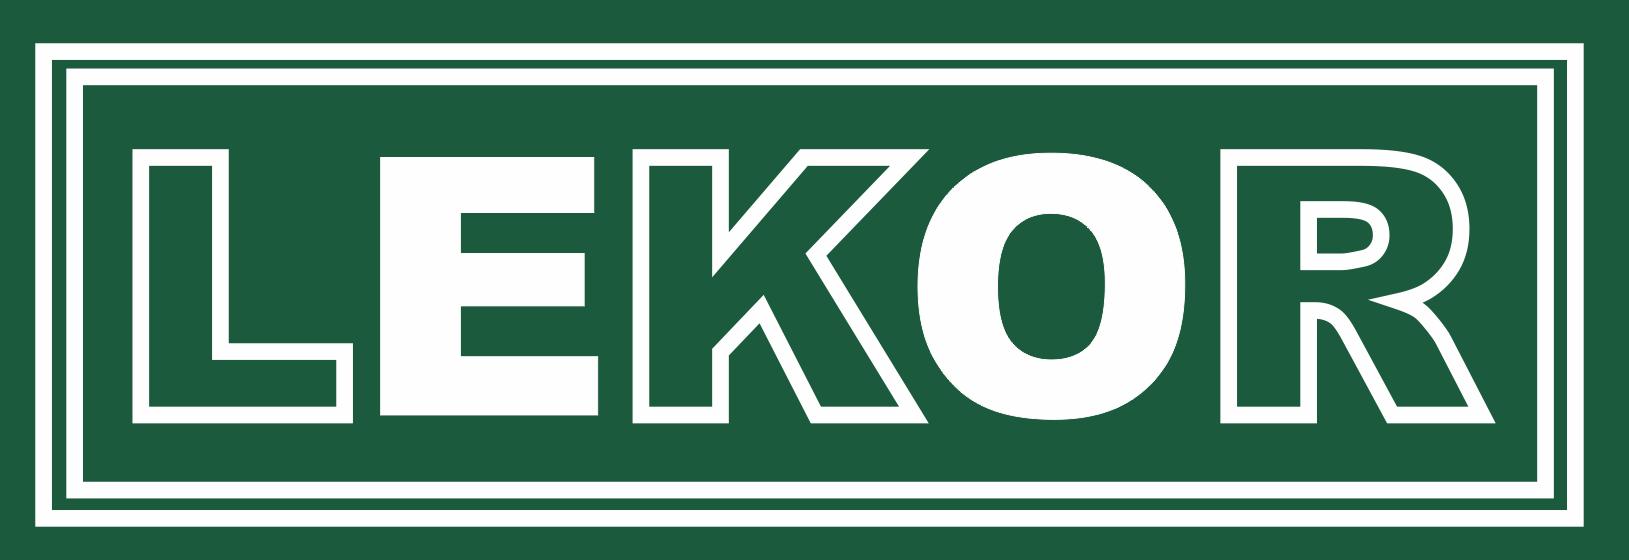 LEKOR logo 2016